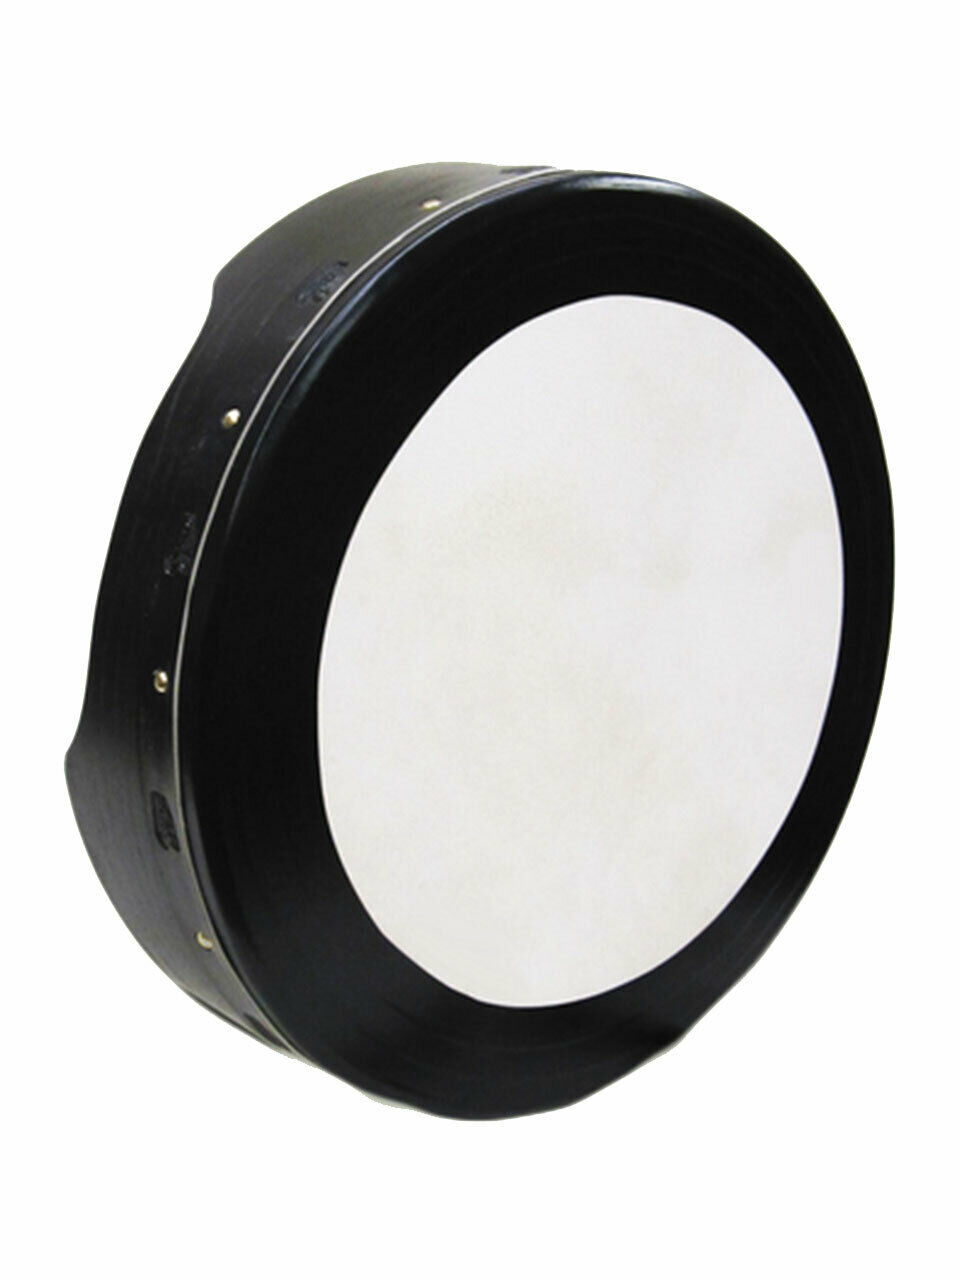 Paraic McNeela 18  Non-tuneable Bodhran Irish Drum with Carrier Bag